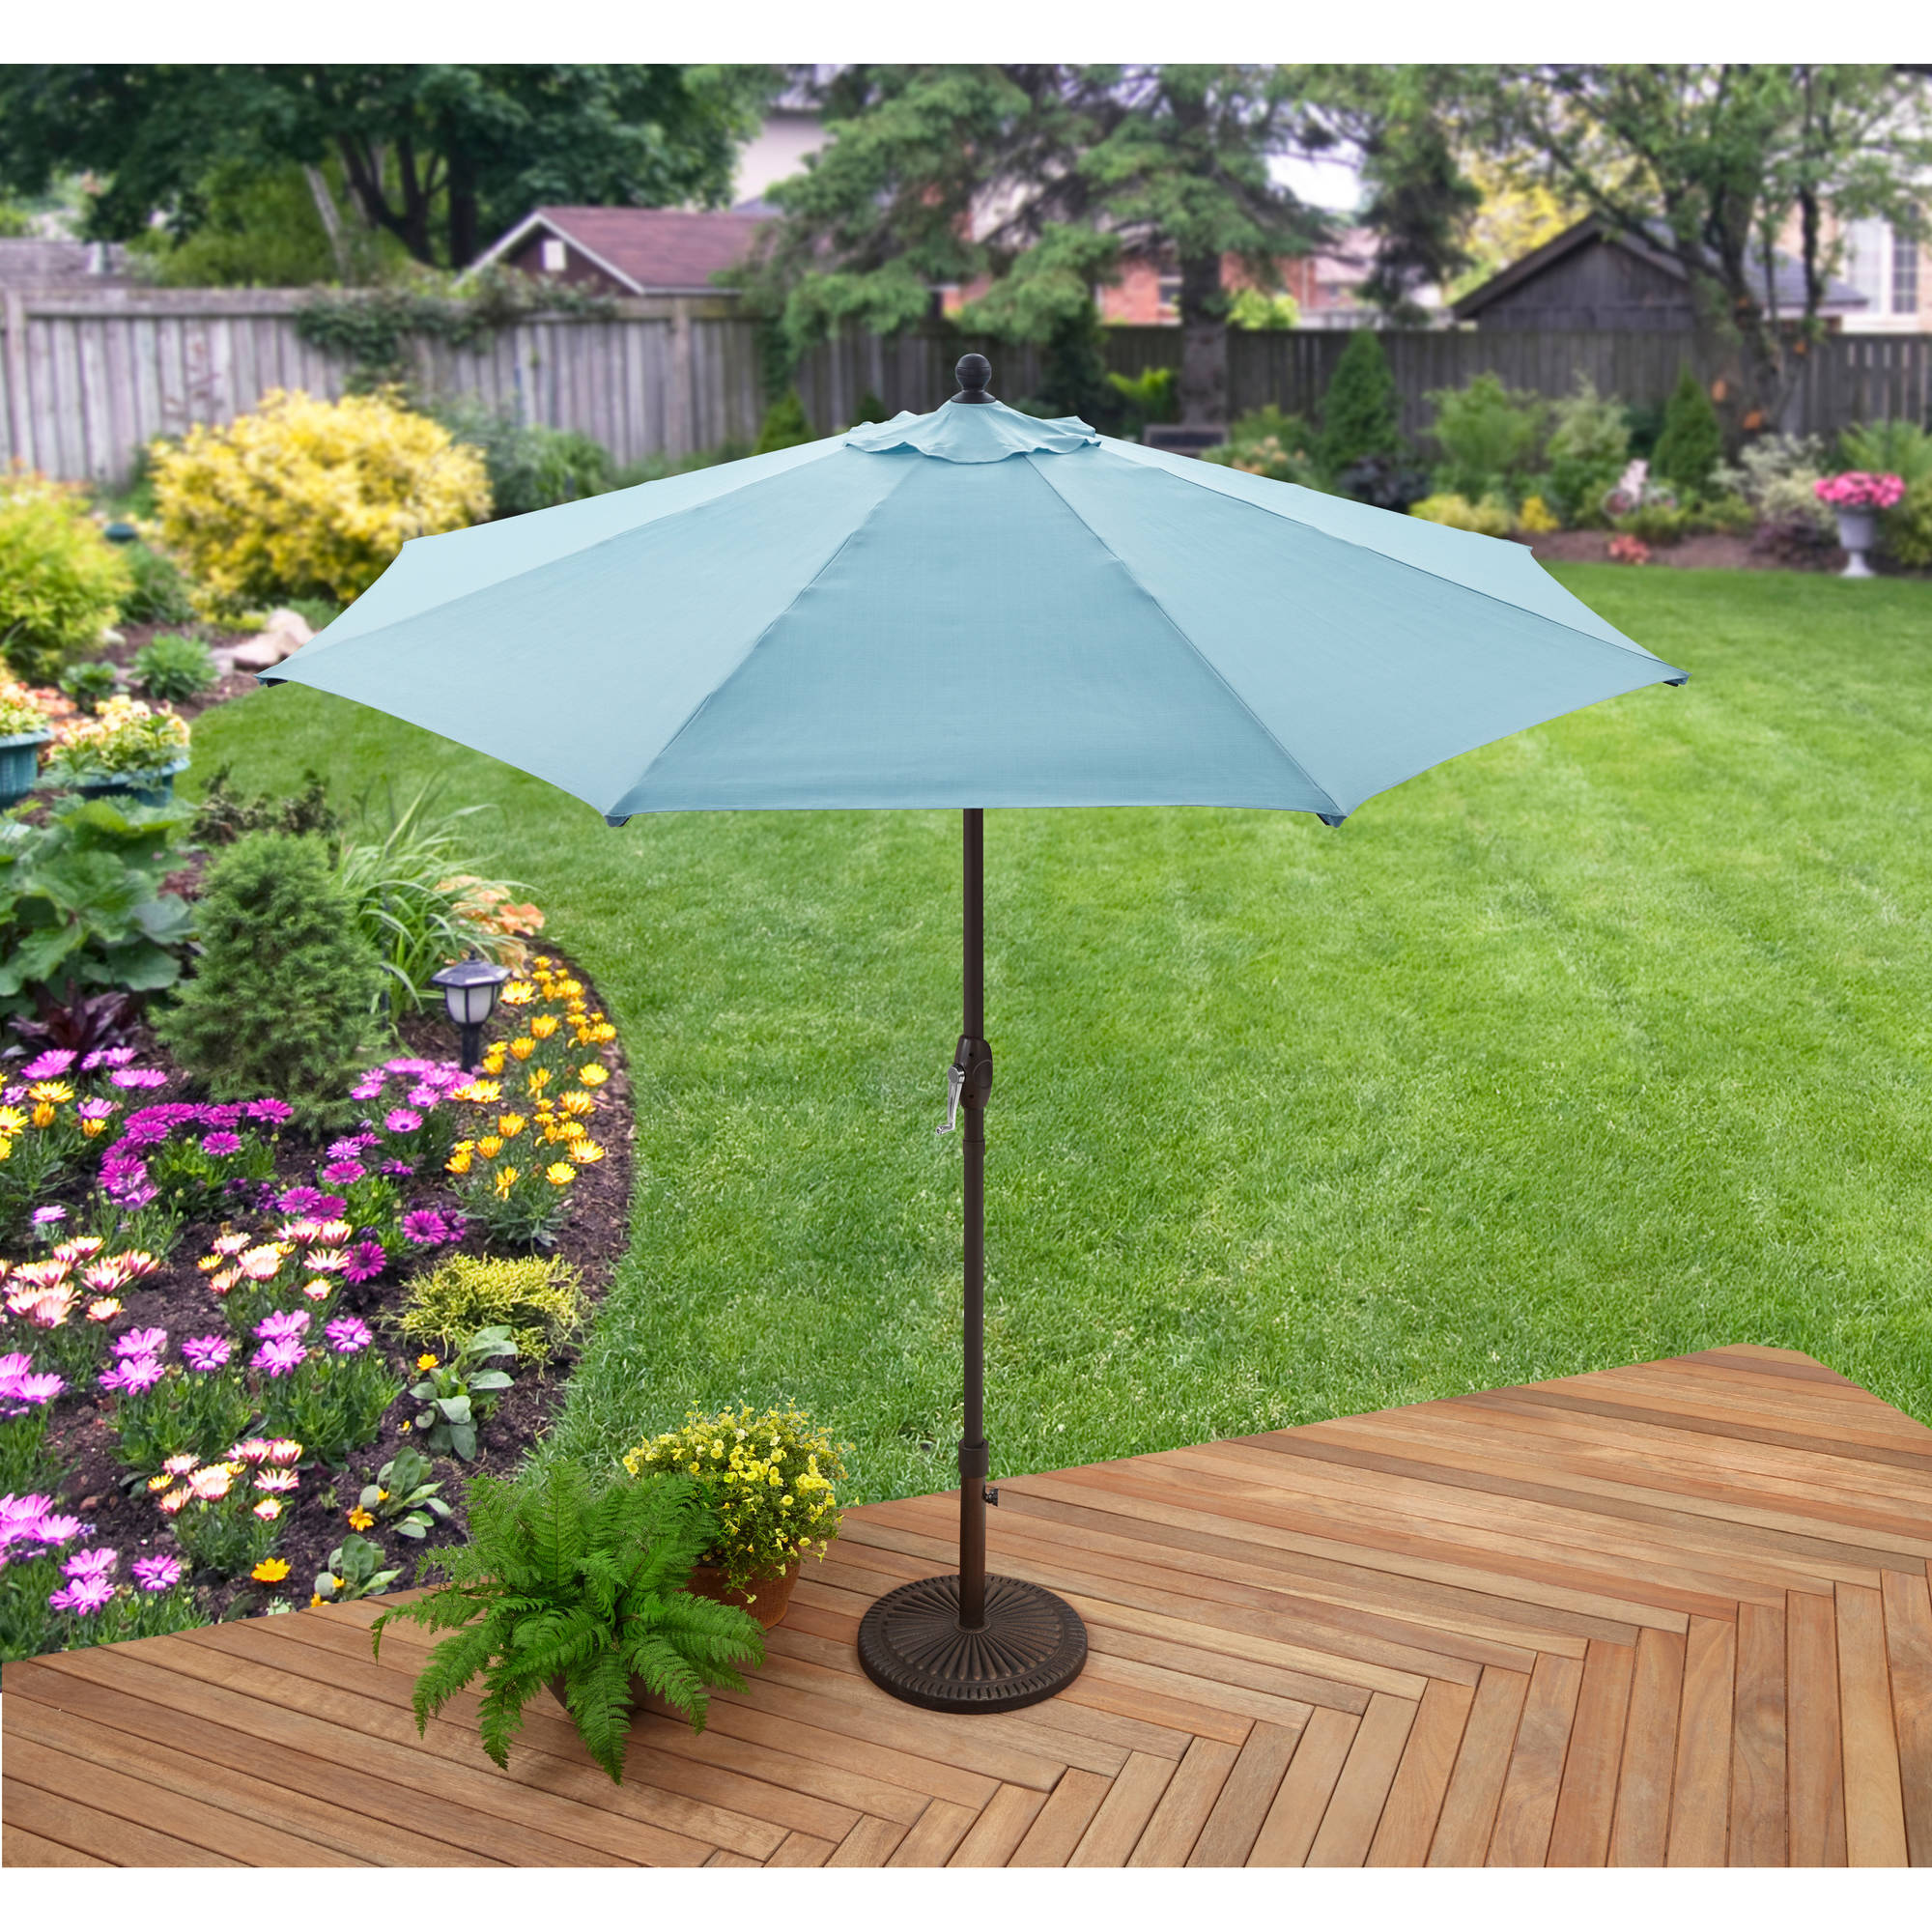 Better Homes and Gardens 9' Market Umbrella, aqua by